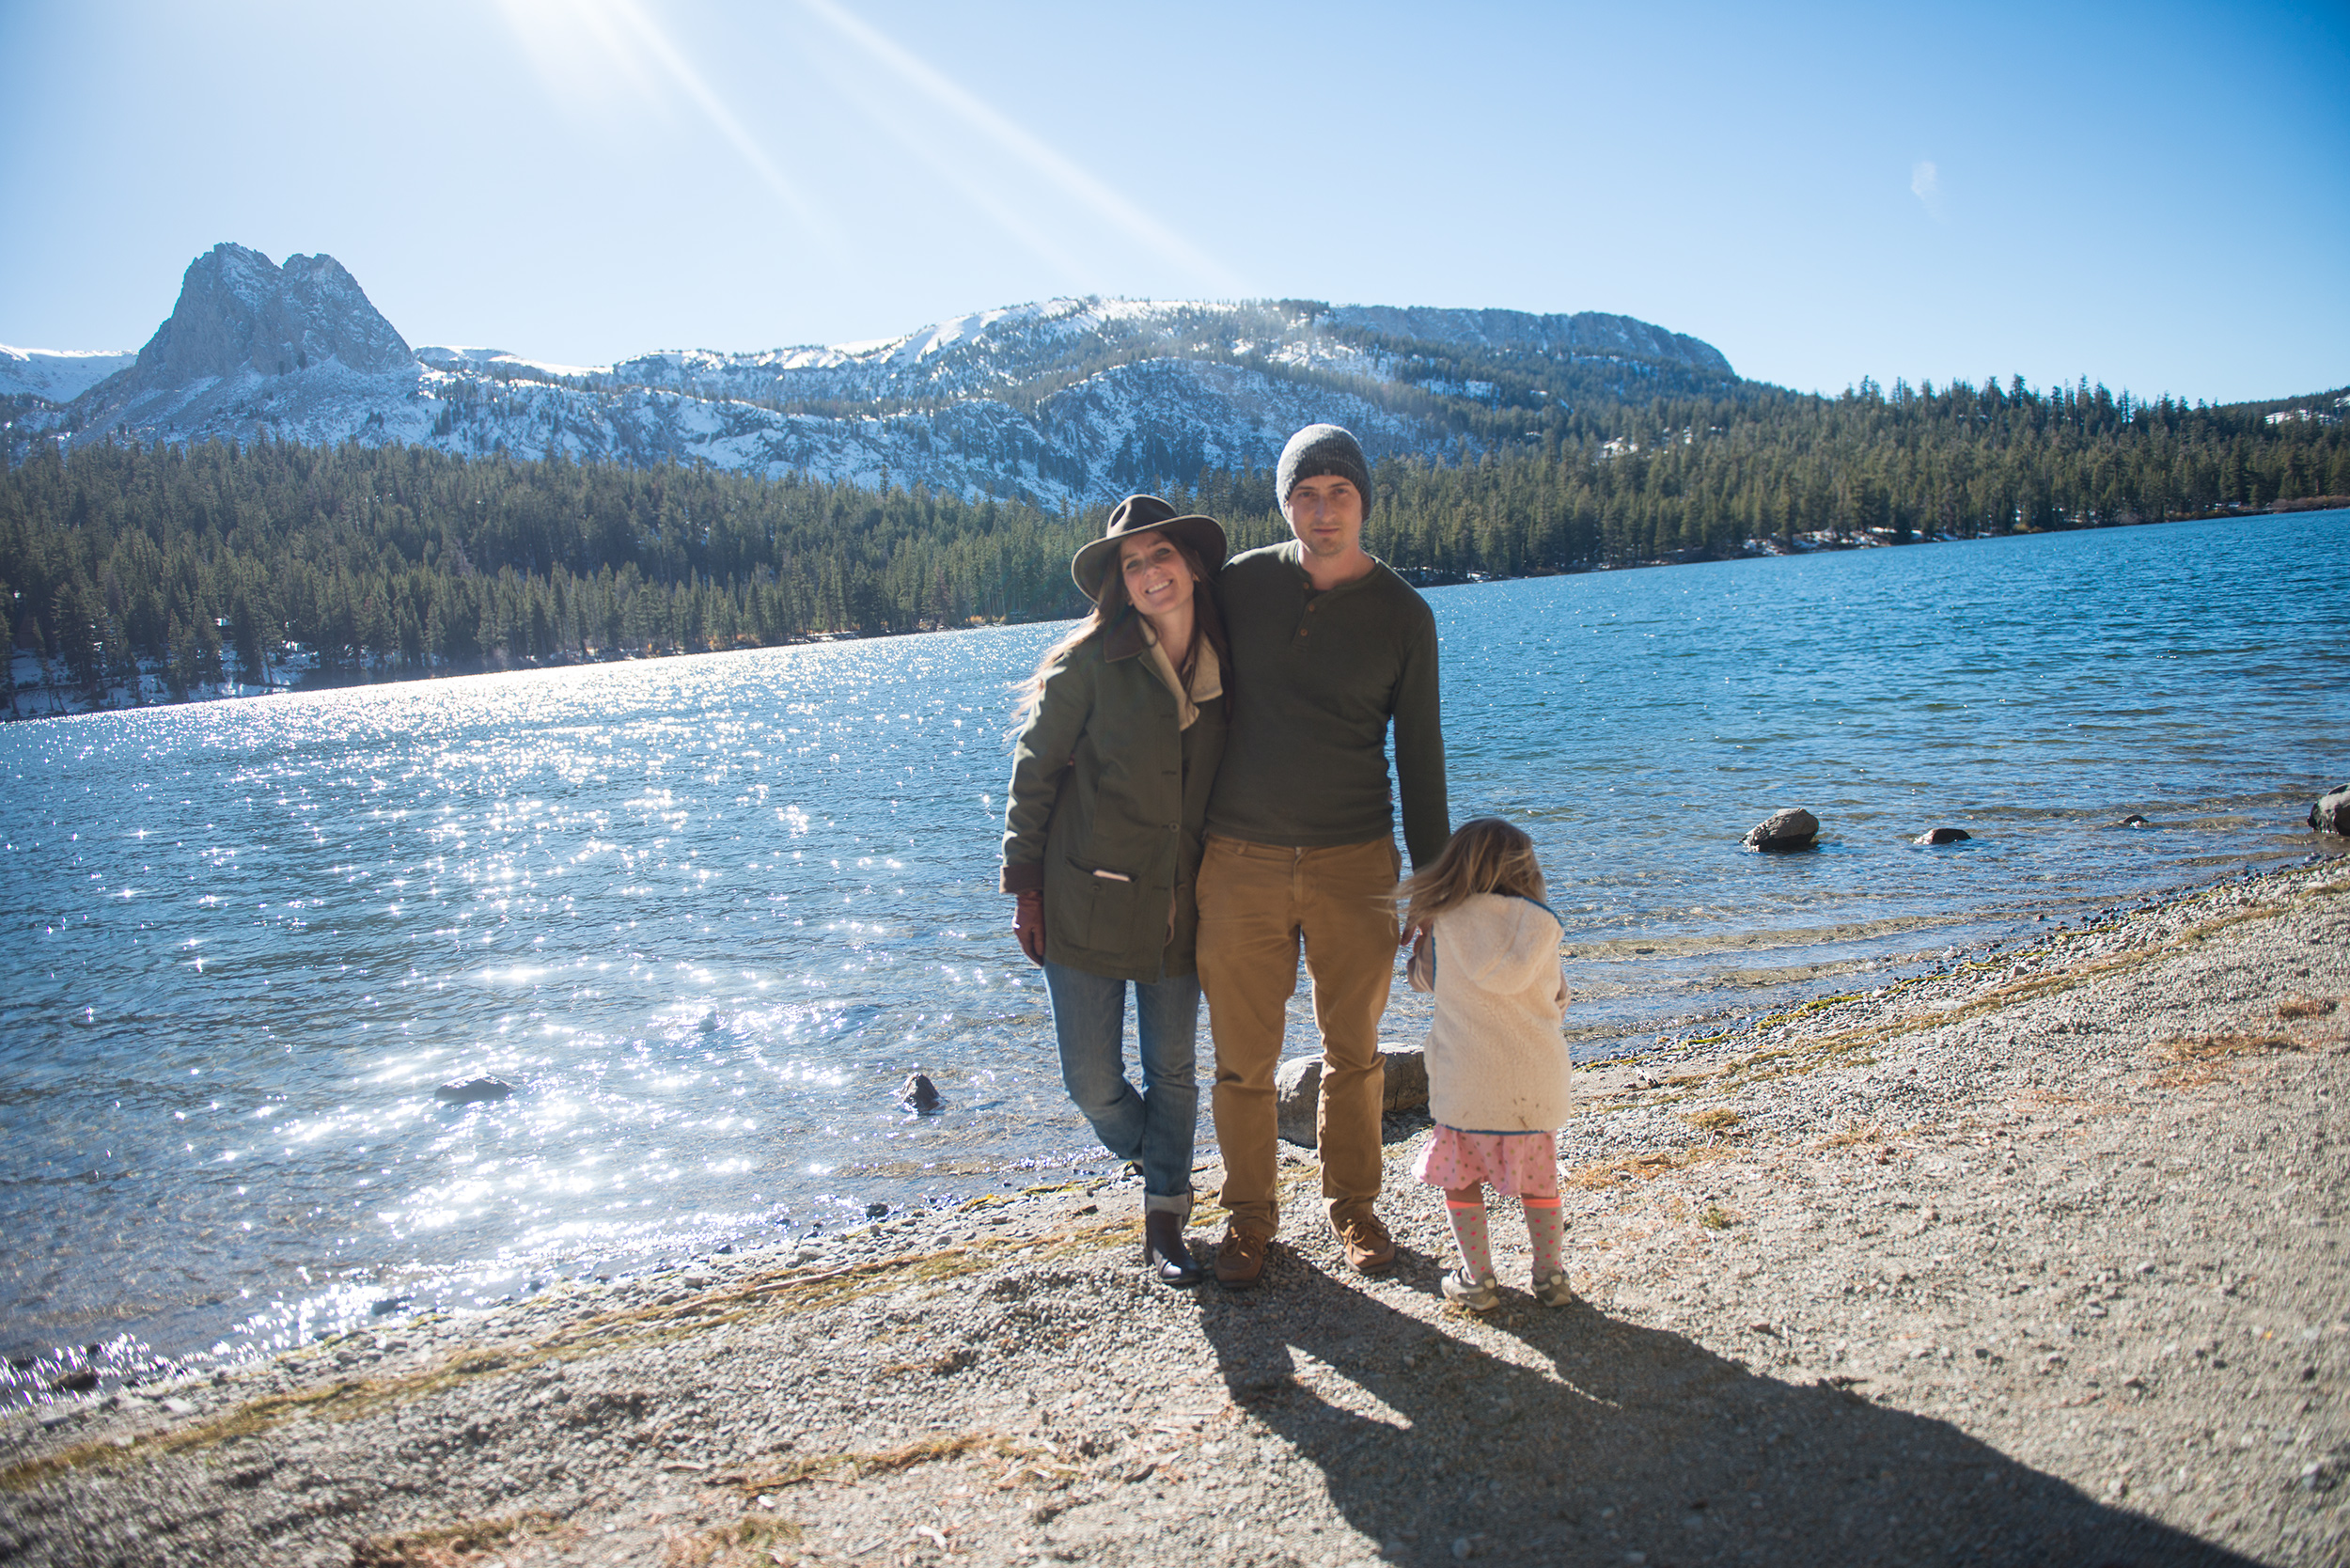 siladke-family-Mammoth-lakes-2016-2.jpg